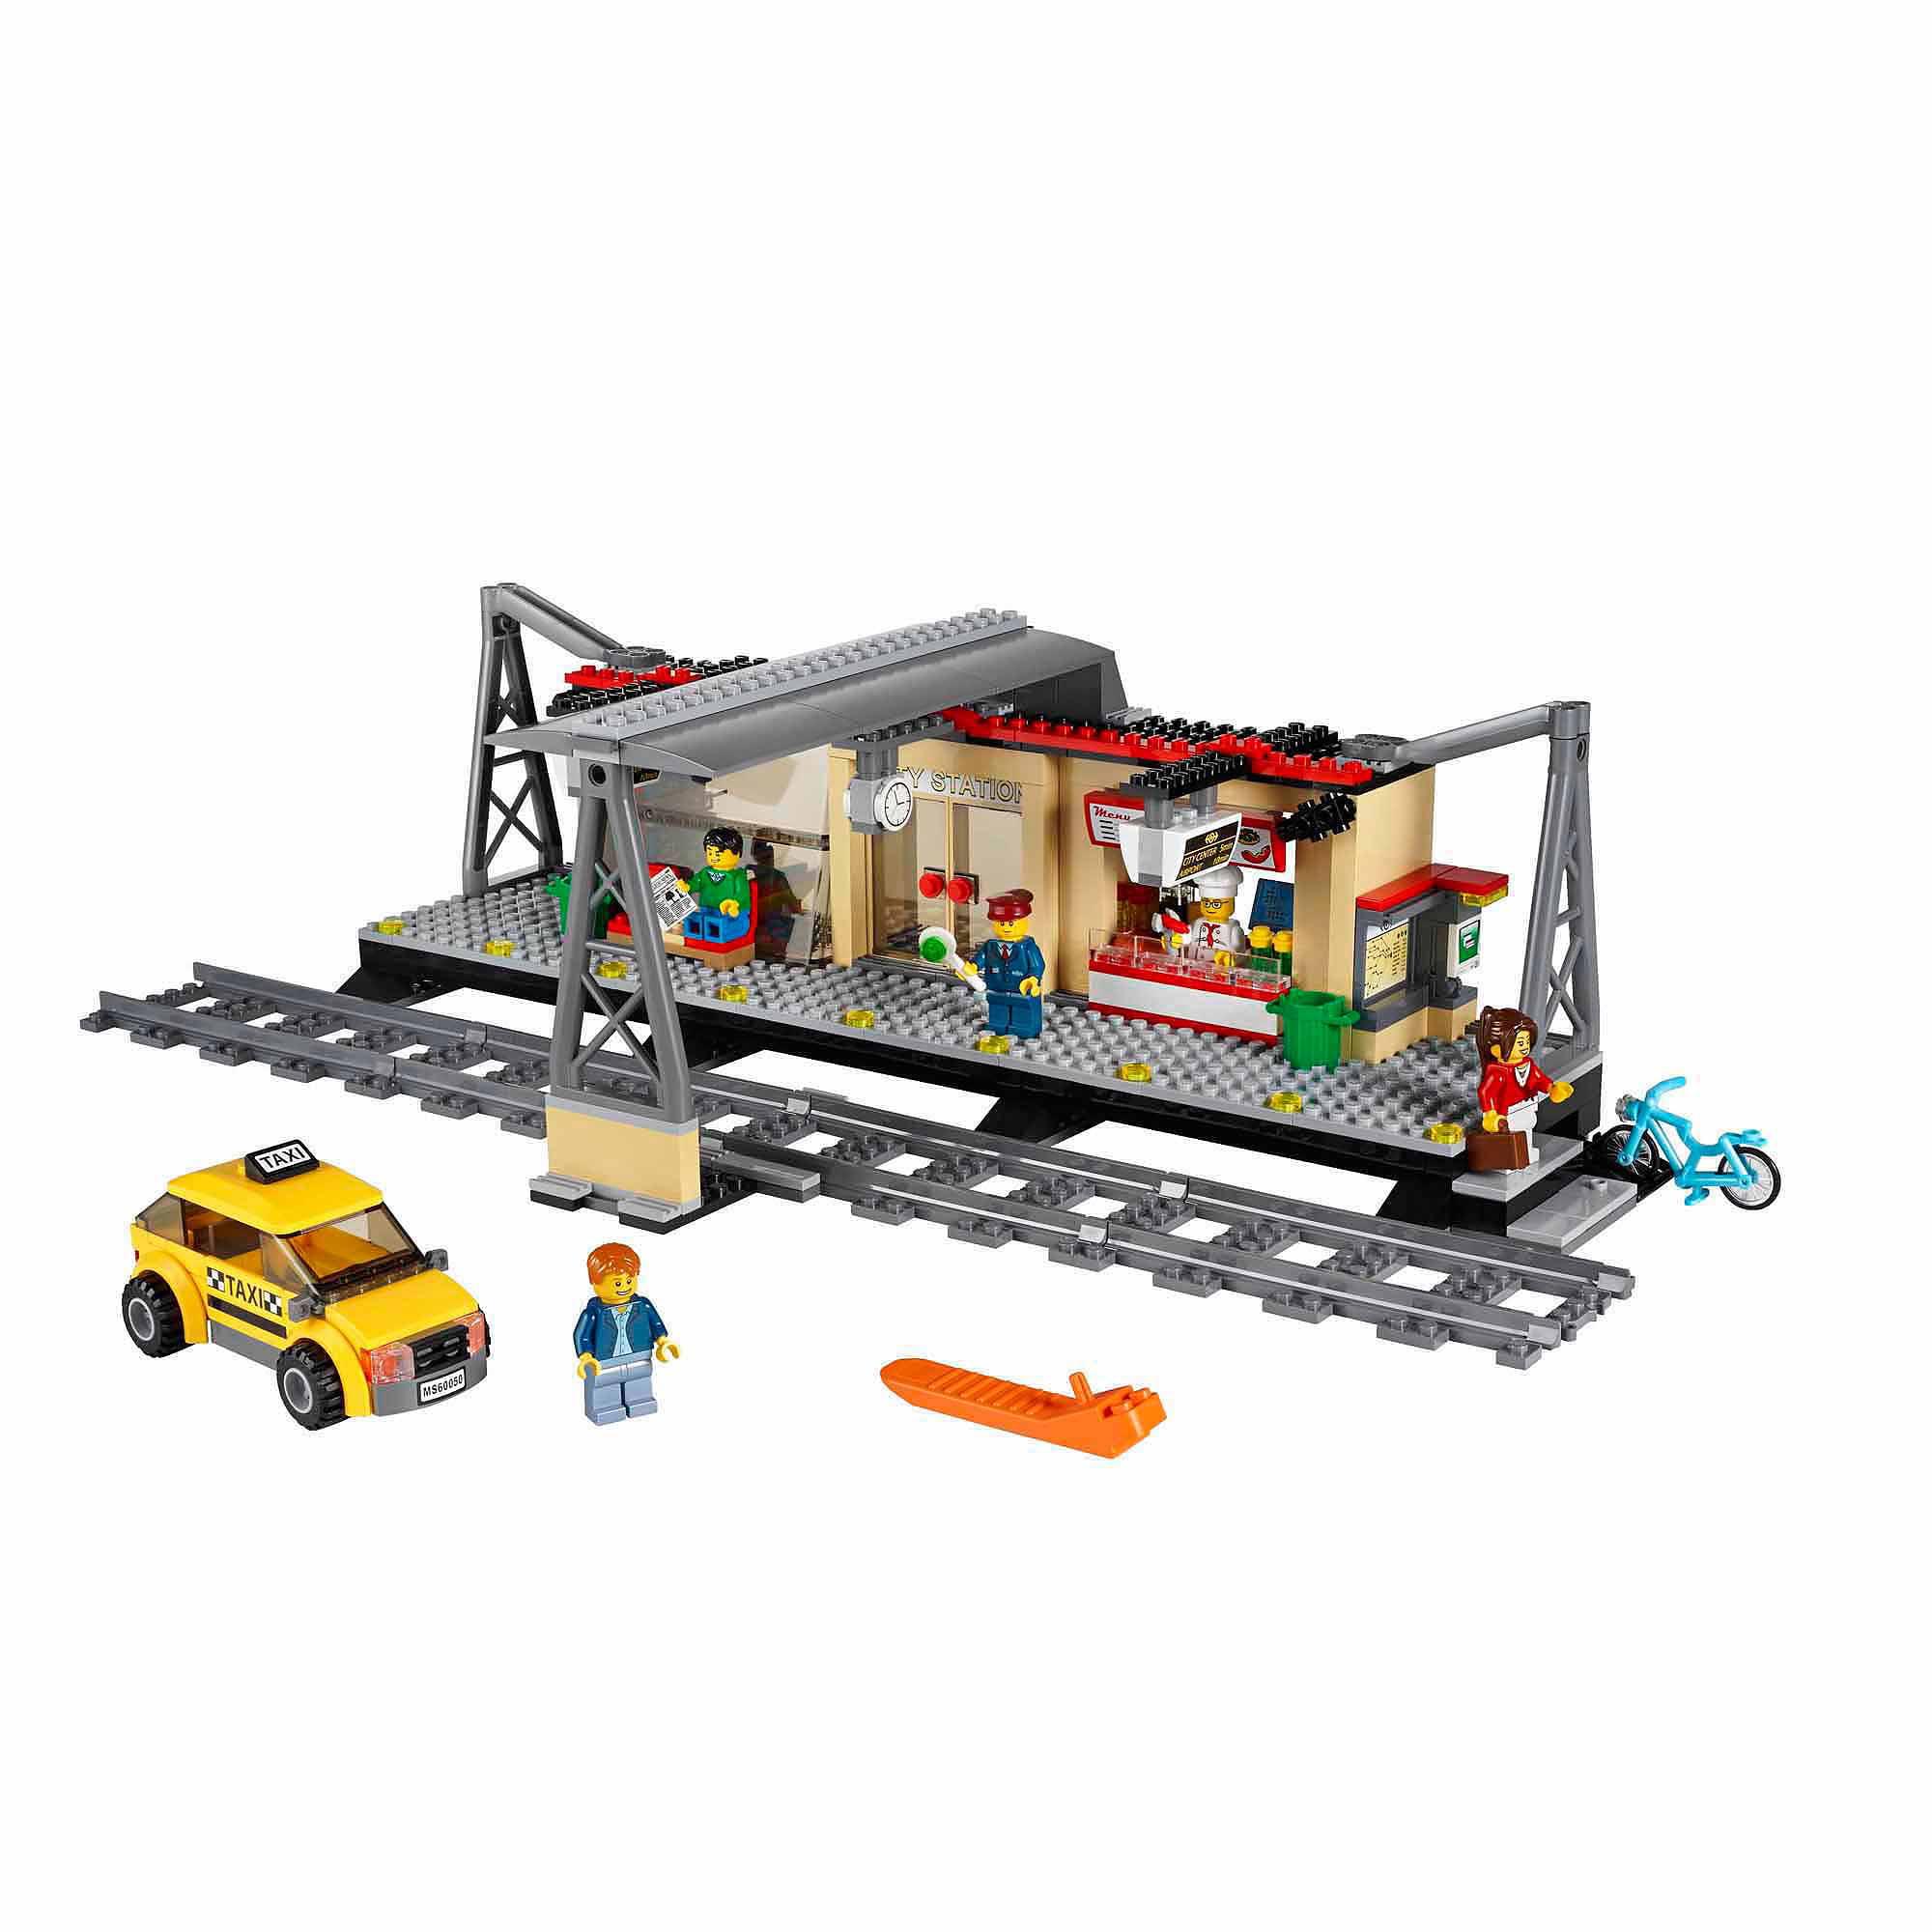 LEGO City Trains Train Station